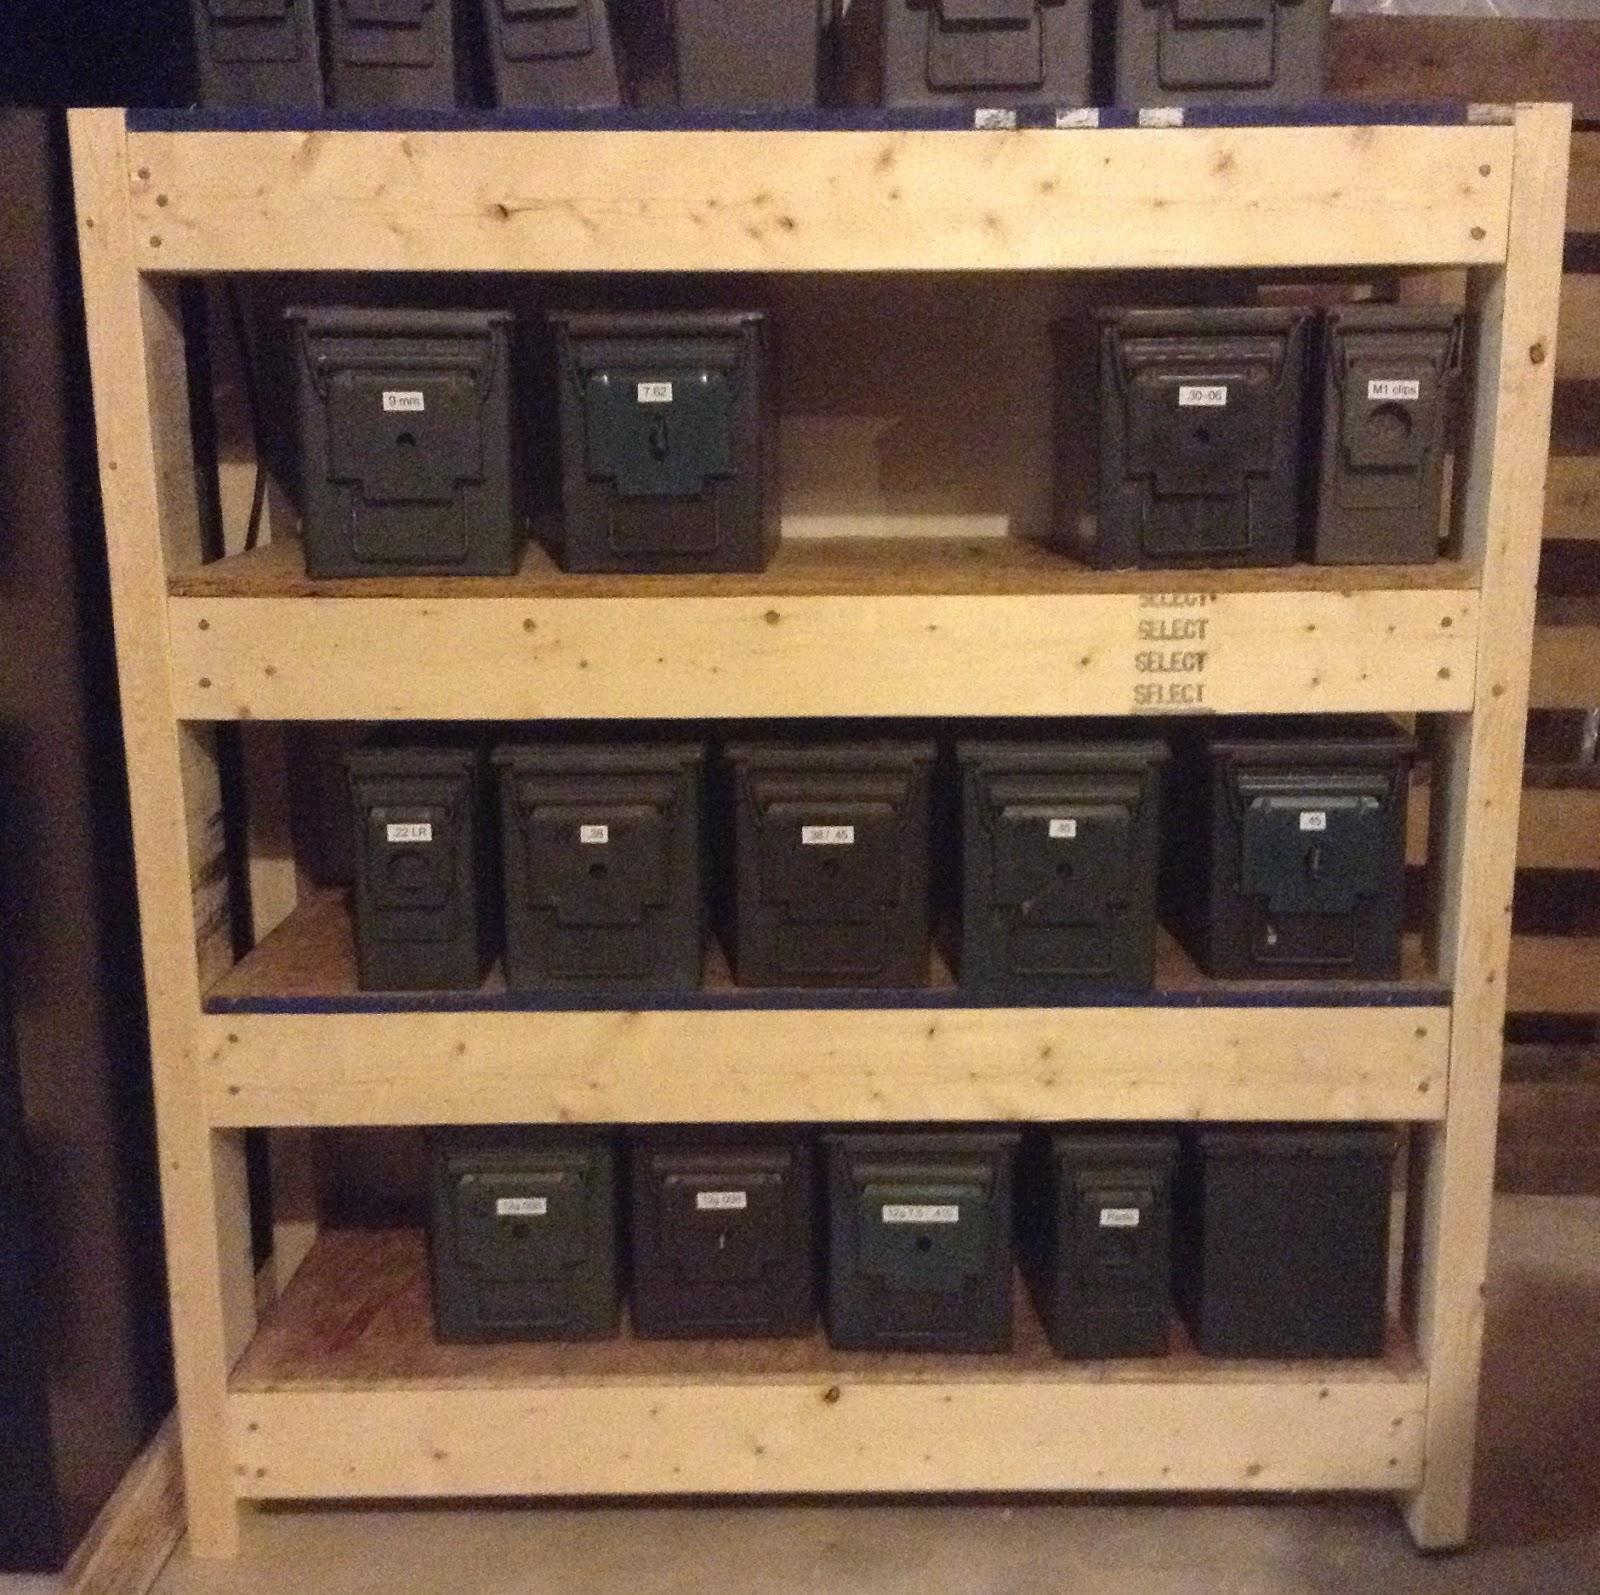 Diy Defense Ammo Shelves